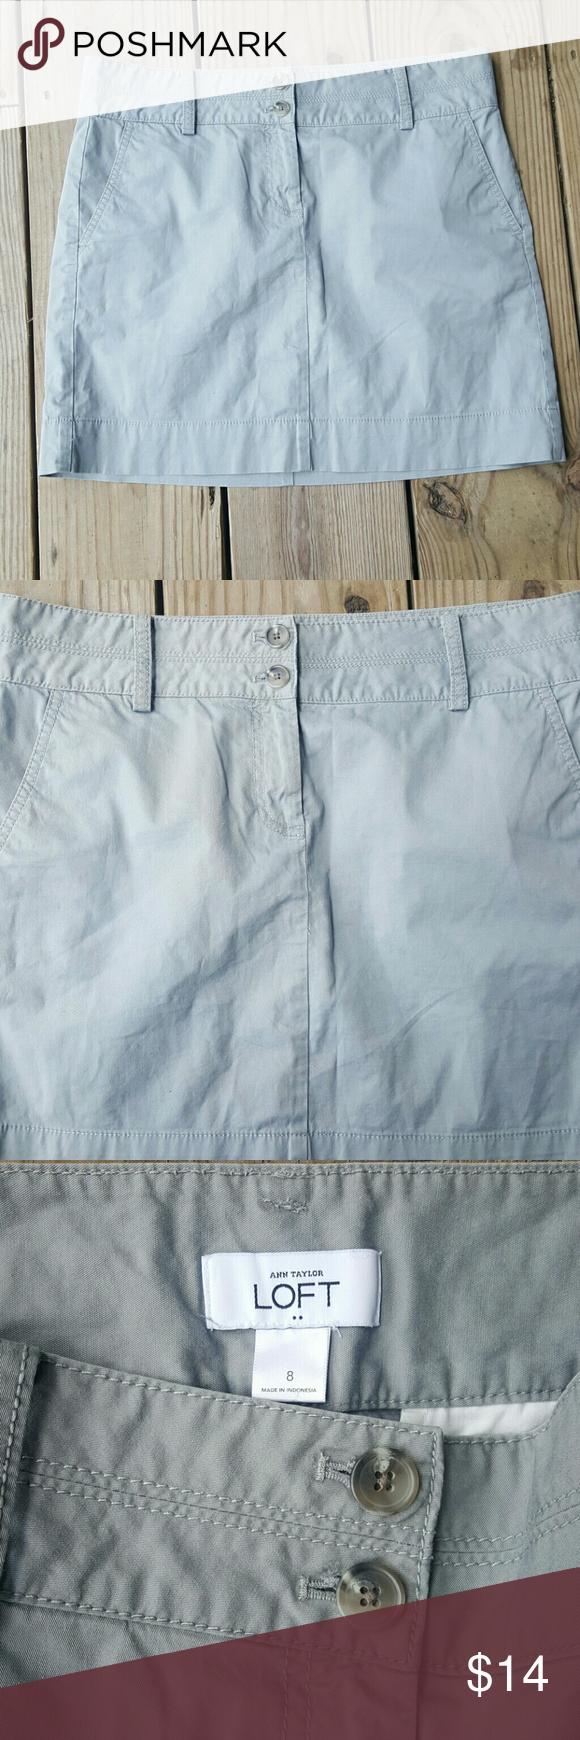 "Ann Taylor LOFT skirt NWOT Gray, cotton/spandex blend, length 17"", size 8, NWOT LOFT Skirts Midi"